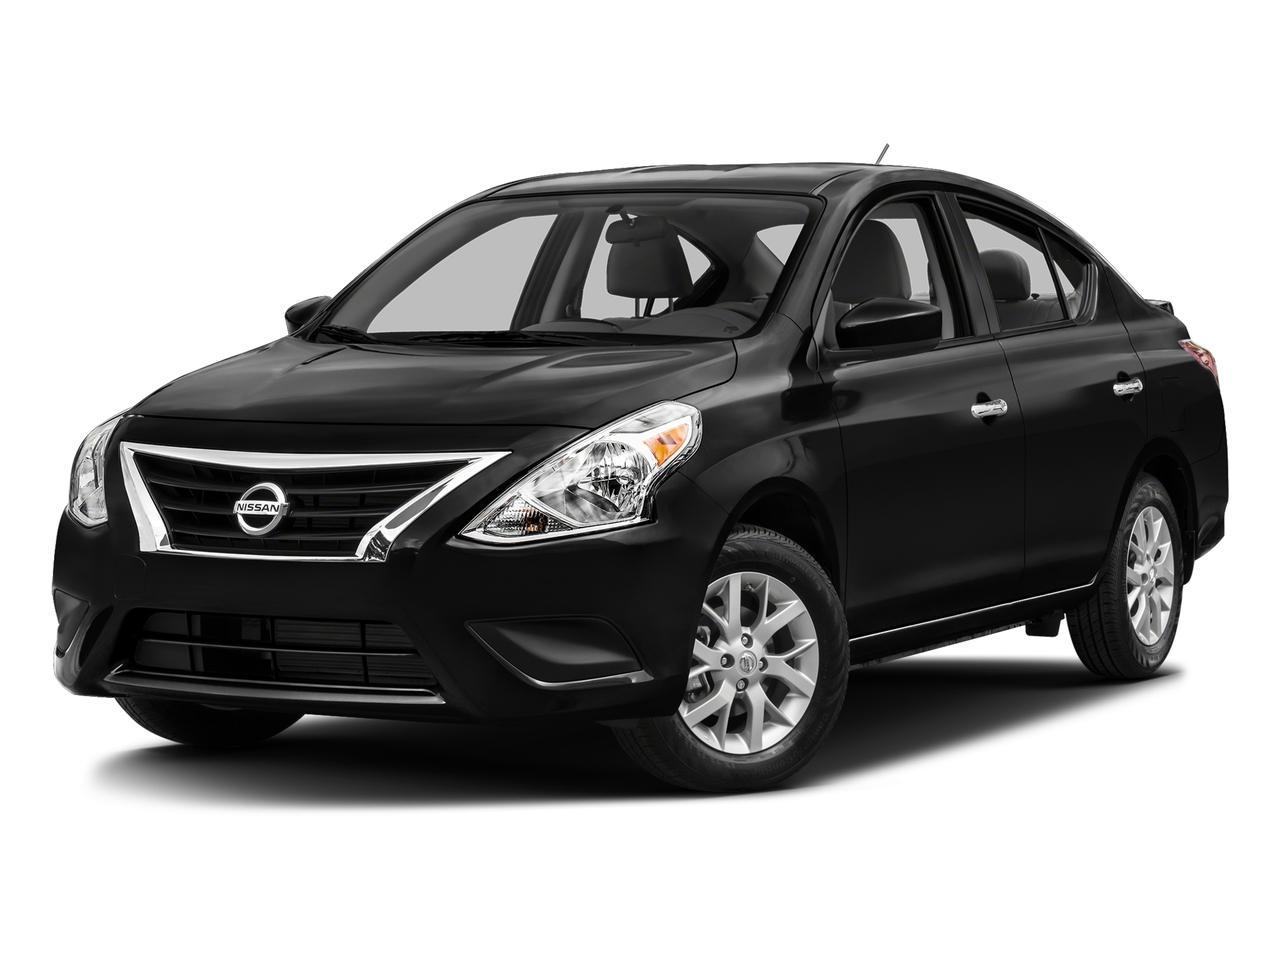 2017 Nissan Versa Sedan Vehicle Photo in Columbus, GA 31904